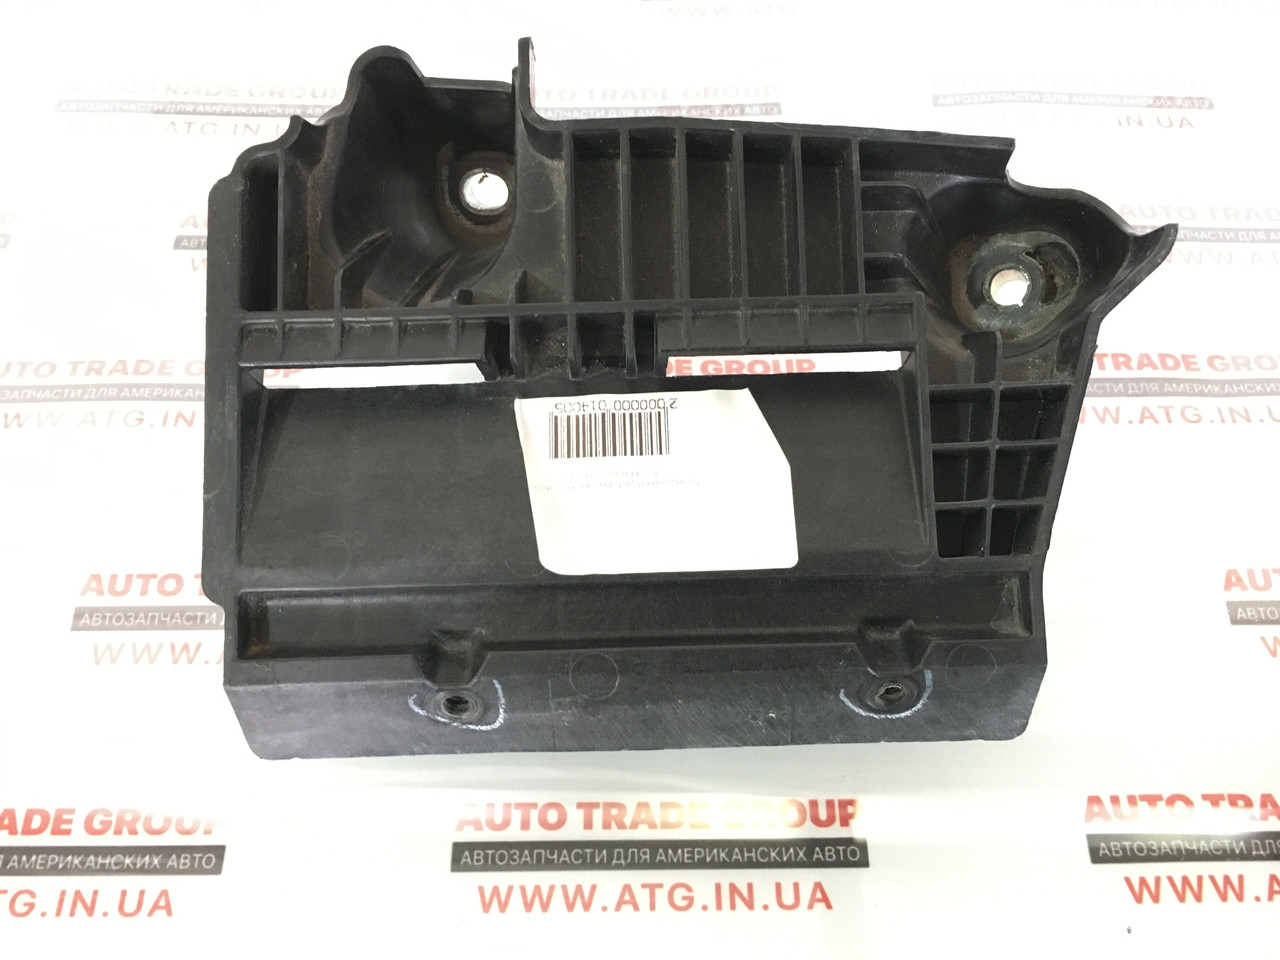 Кронштейн підставки акумулятора Ford Fusion 2013-16 DG93-10663-A